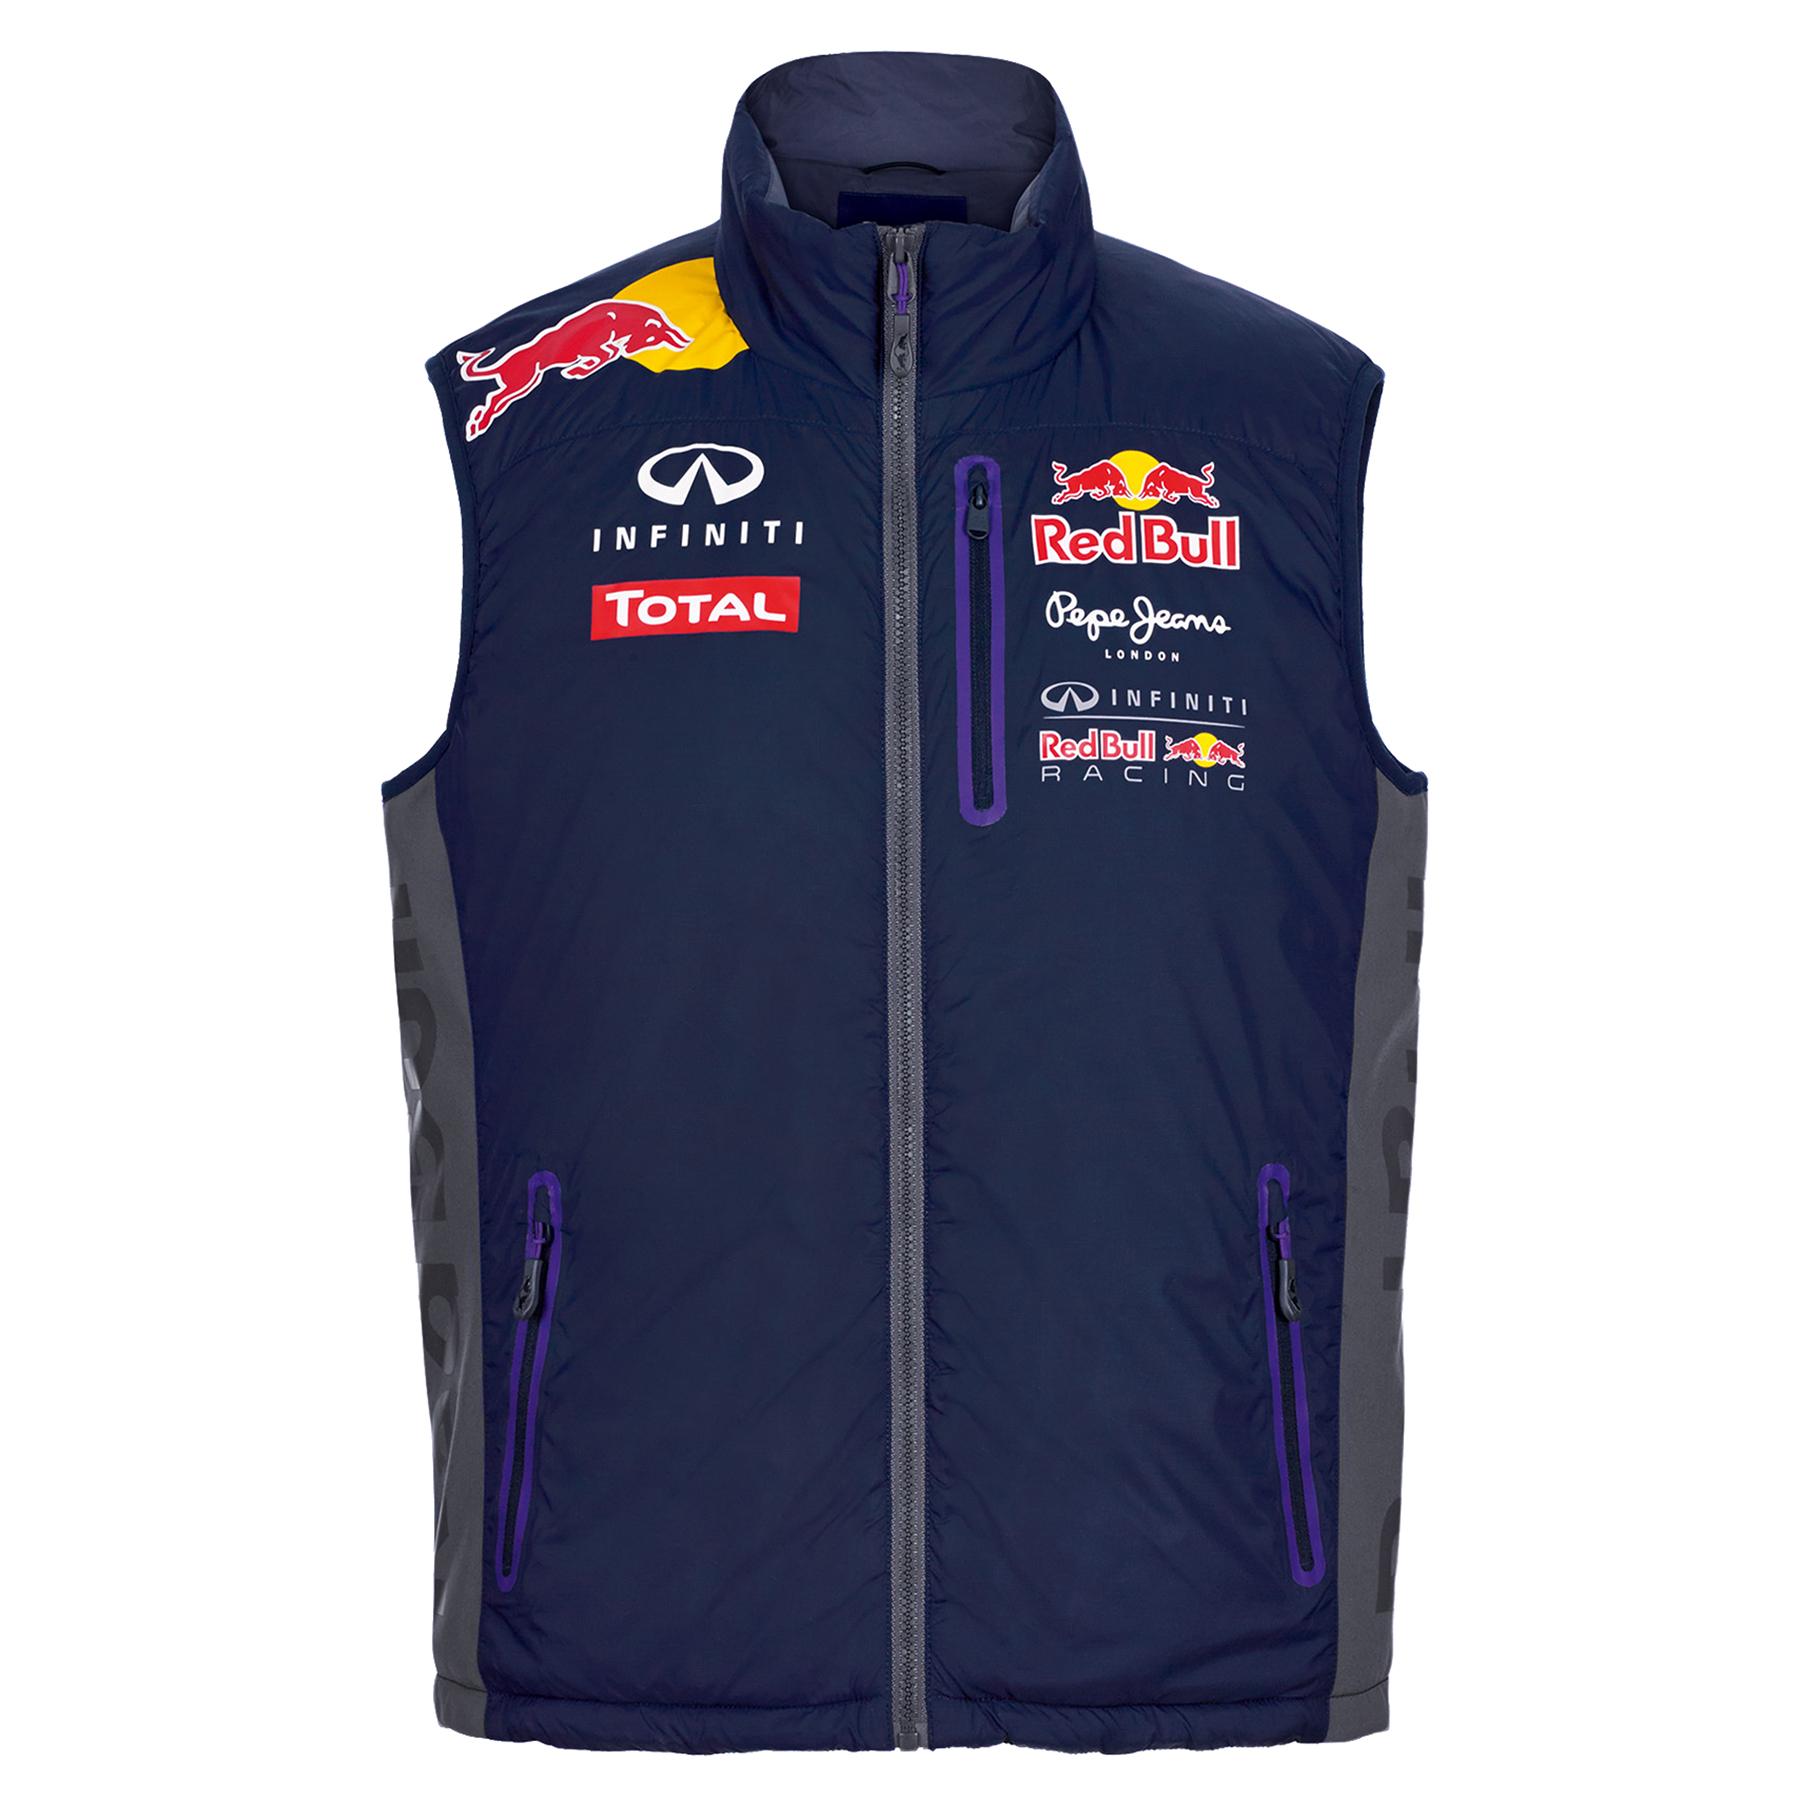 Infiniti Red Bull Racing 2015 Official Teamline Gilet